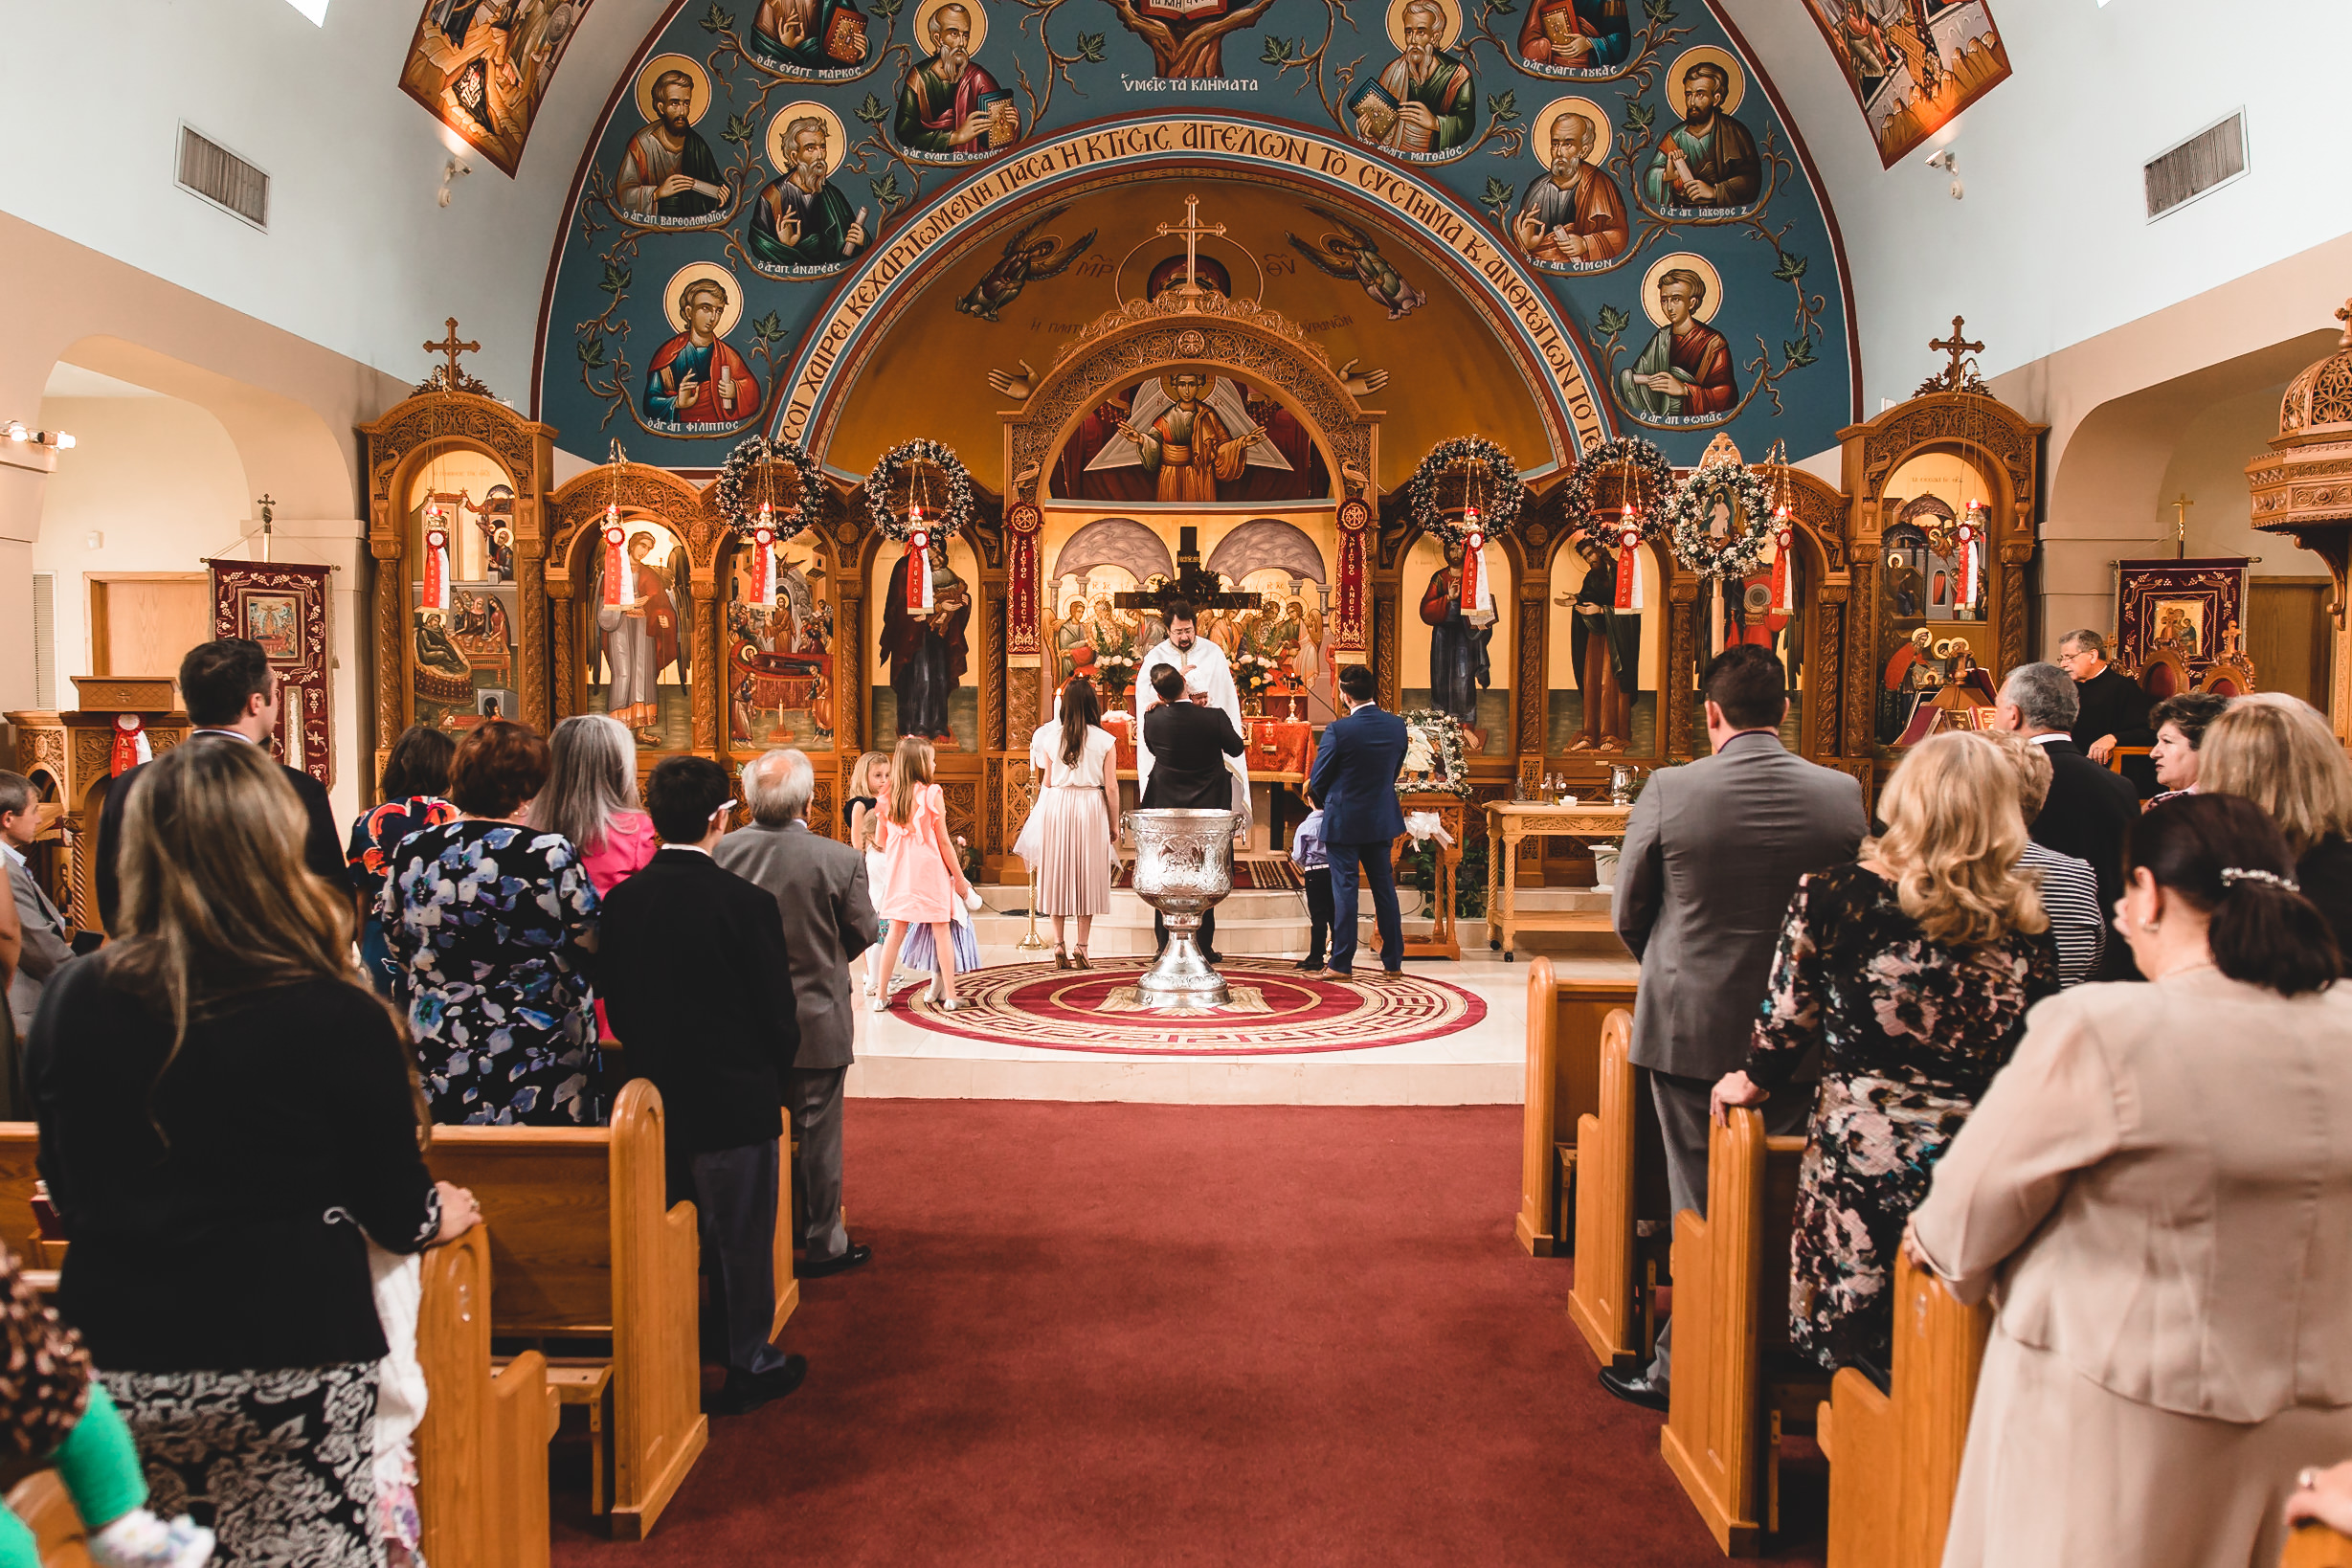 Kimisis Tis Theotokou baptism holmdel nj daniel nydick (30 of 36).jpg